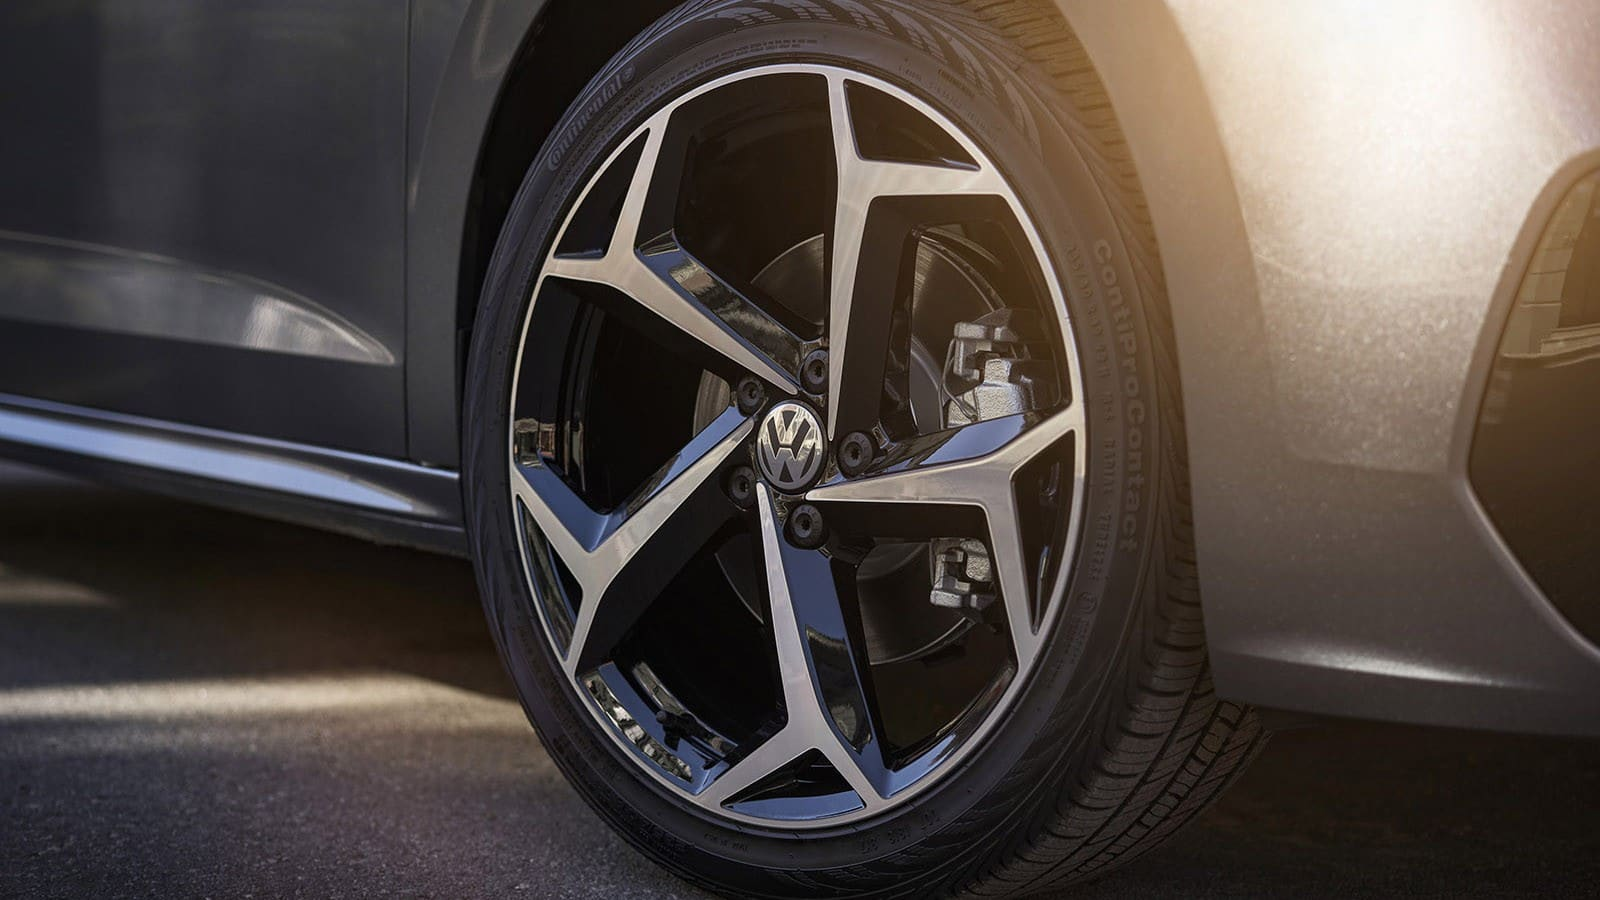 Volkswagen Passat 2020 model'nogo goda - obzor, kolesa, diski, cena v rossii